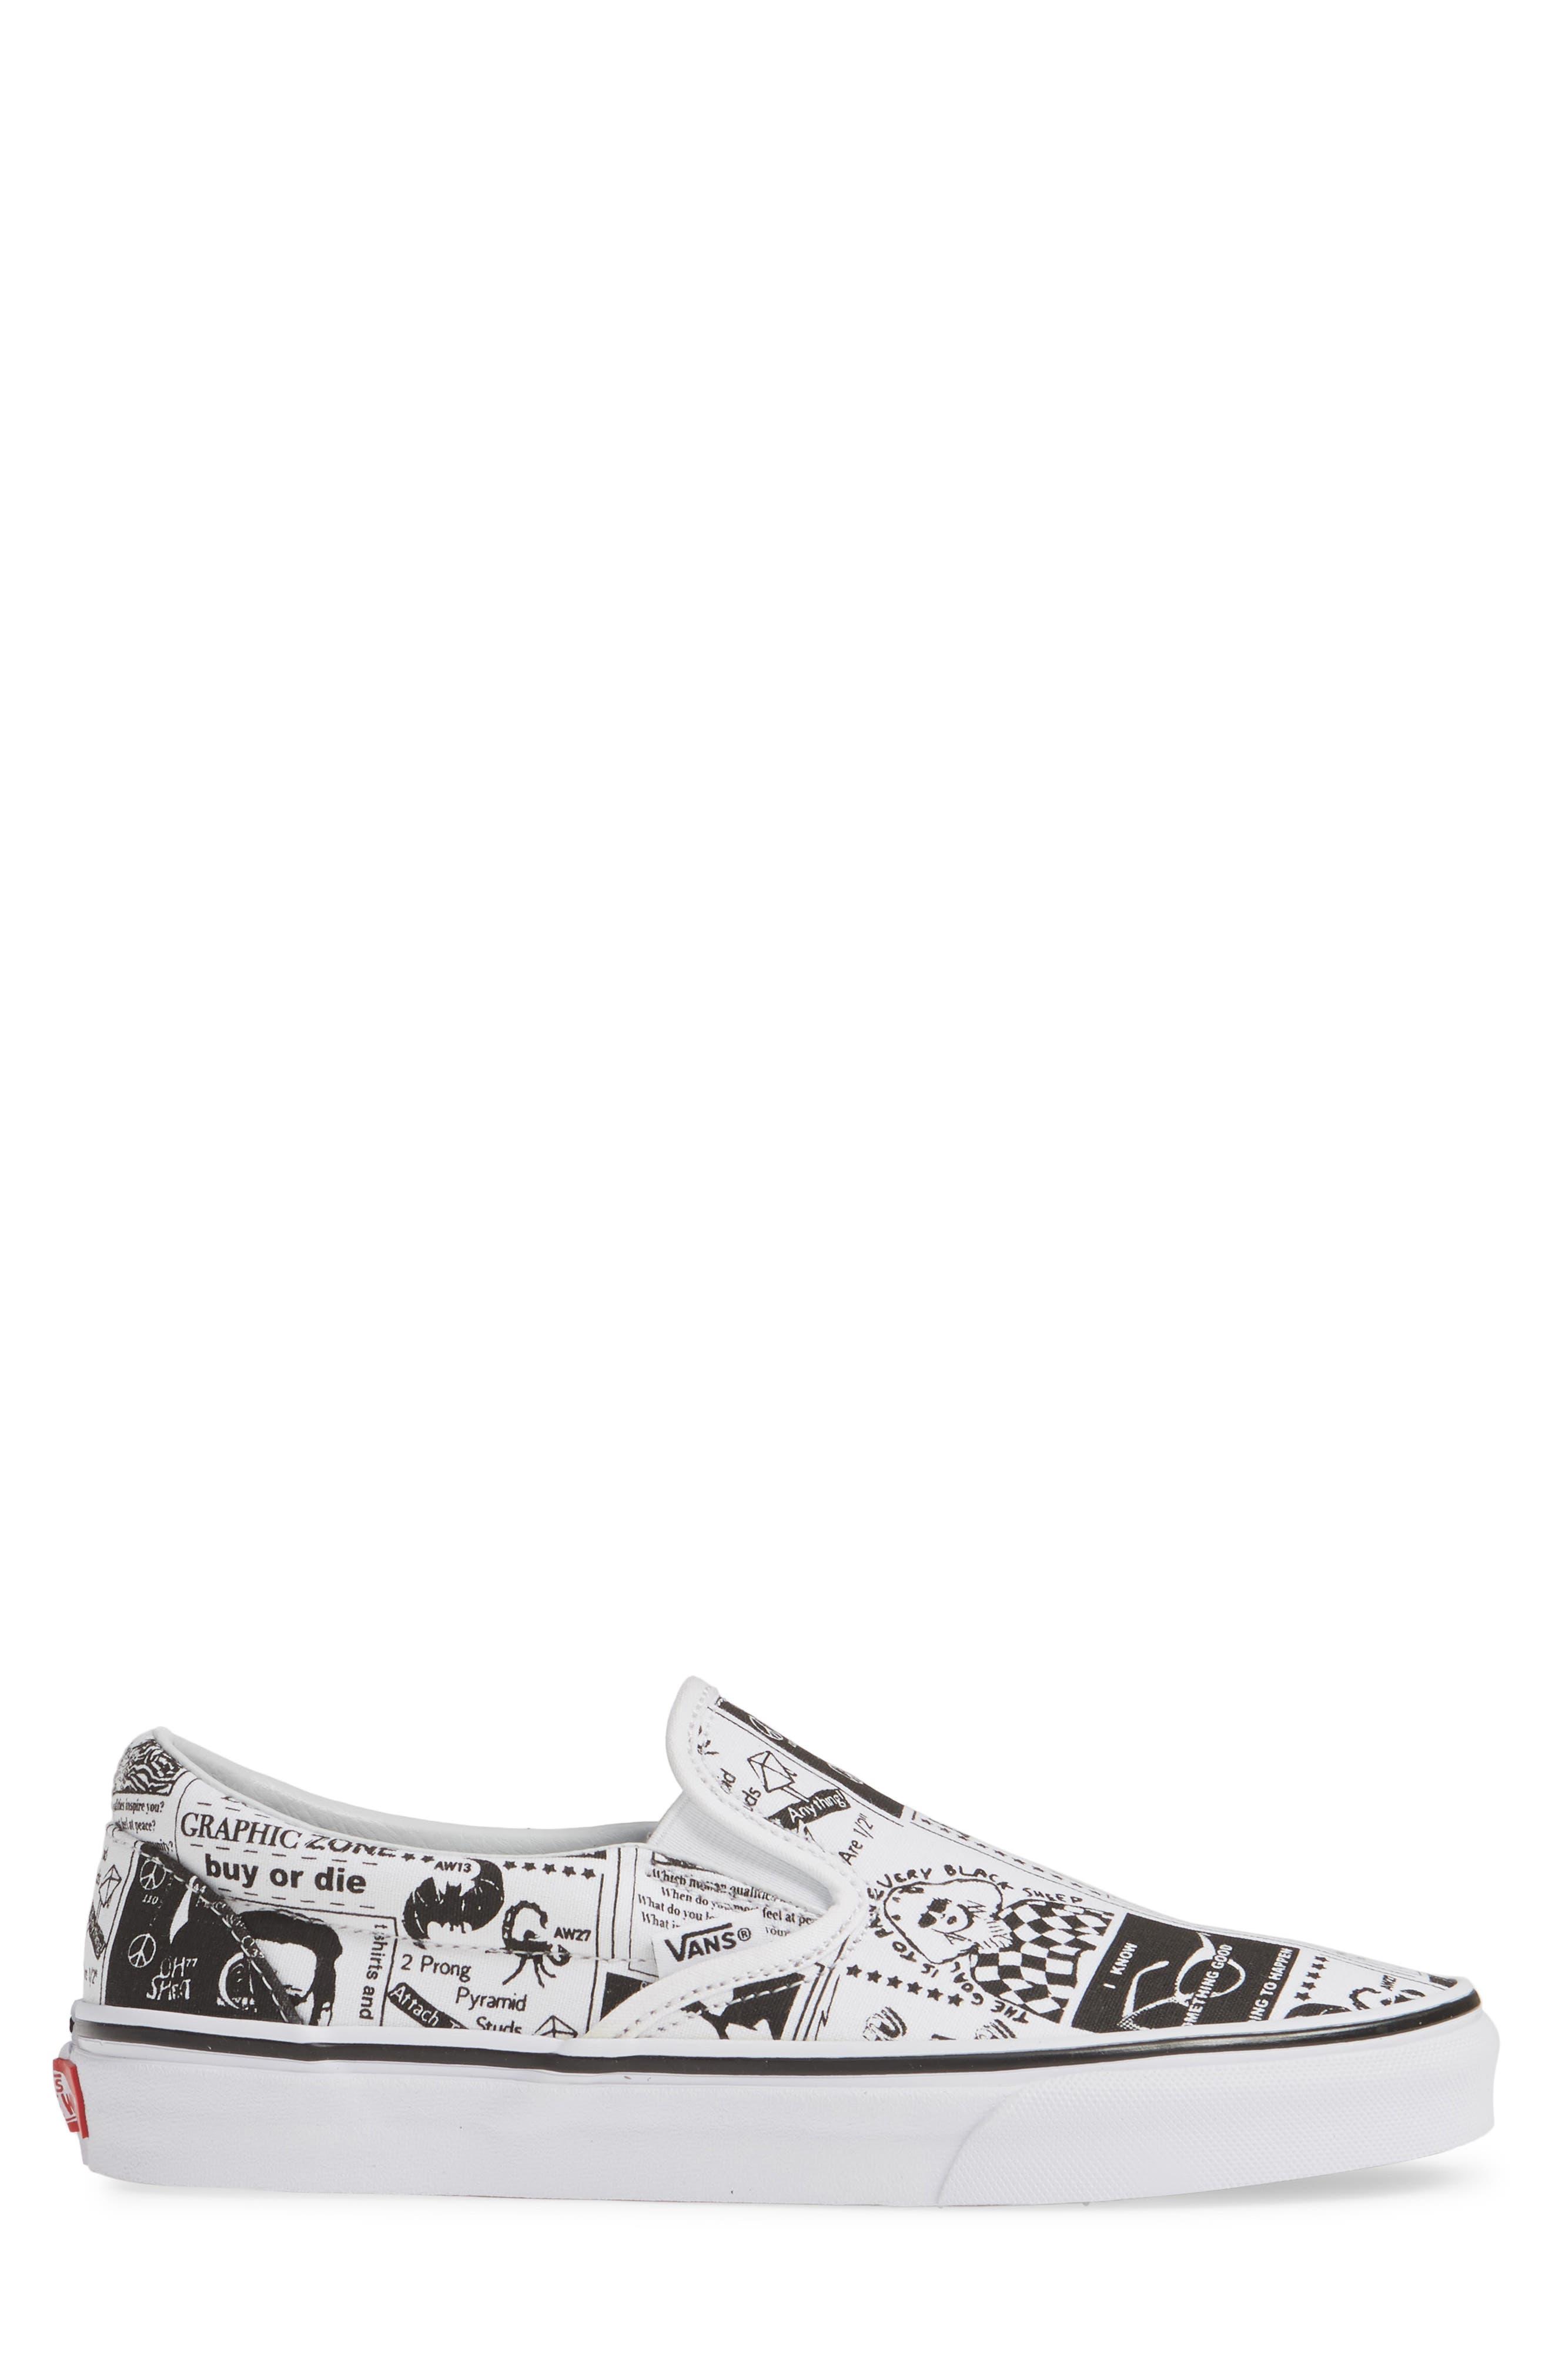 VANS,                             x Ashley Williams Print Classic Slip-On Sneaker,                             Alternate thumbnail 3, color,                             100